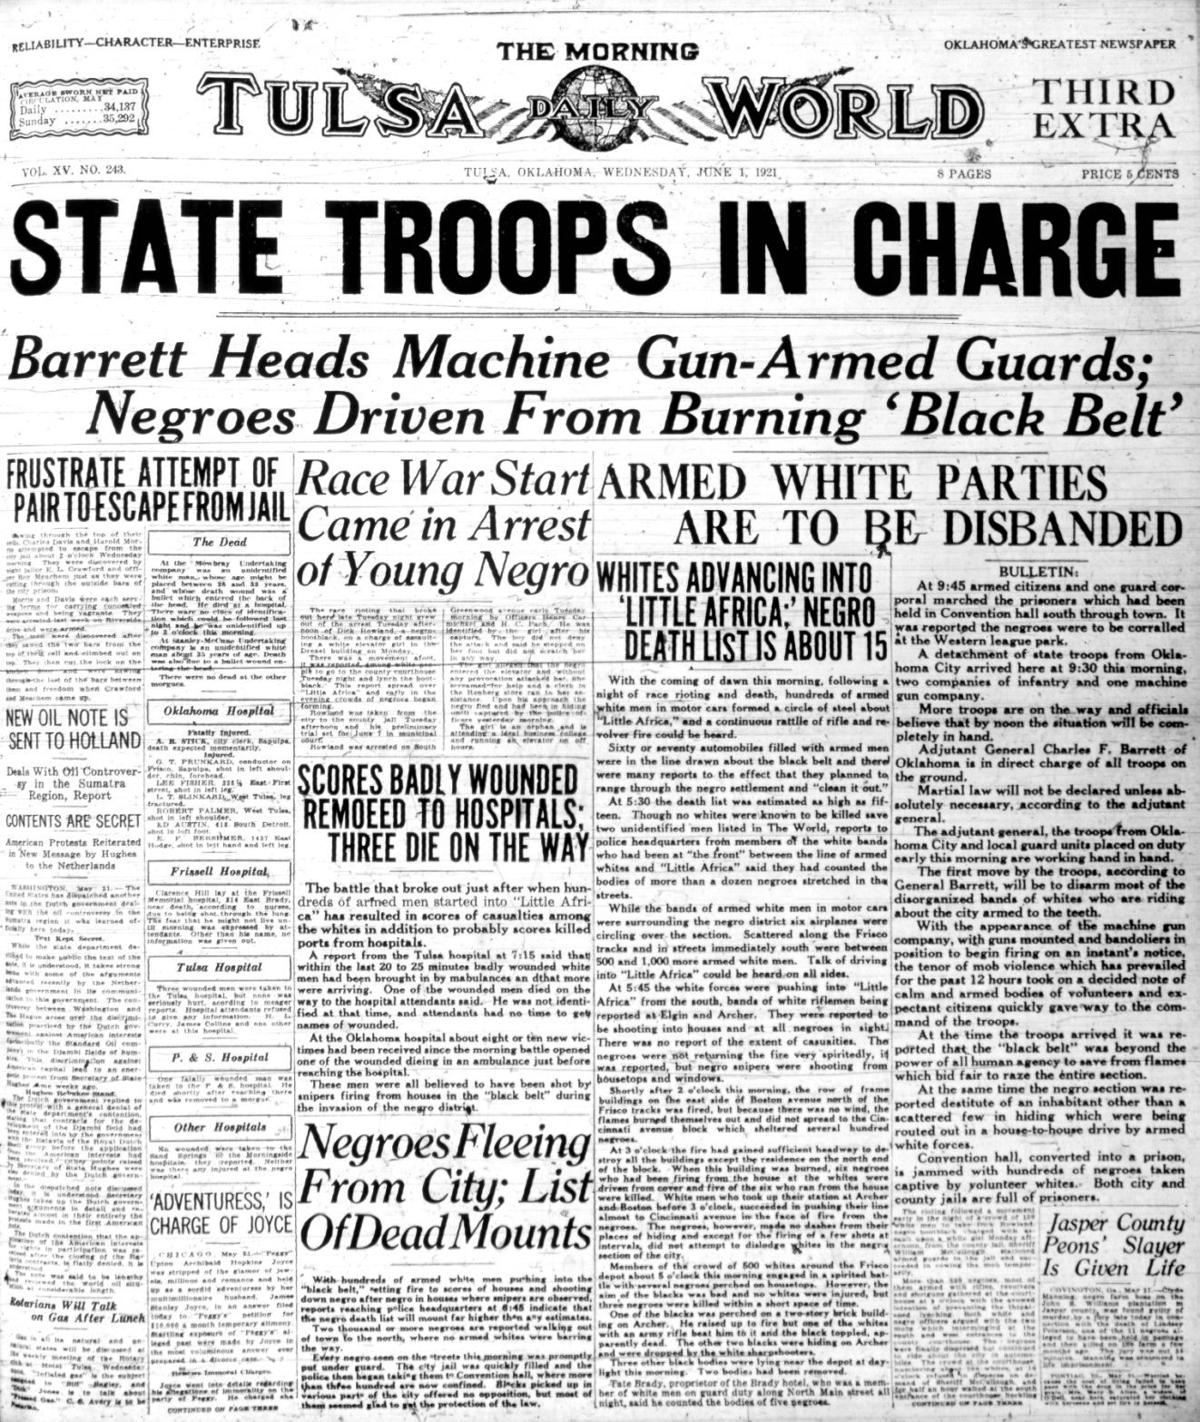 Third extra, Tulsa World, June 1, 1921